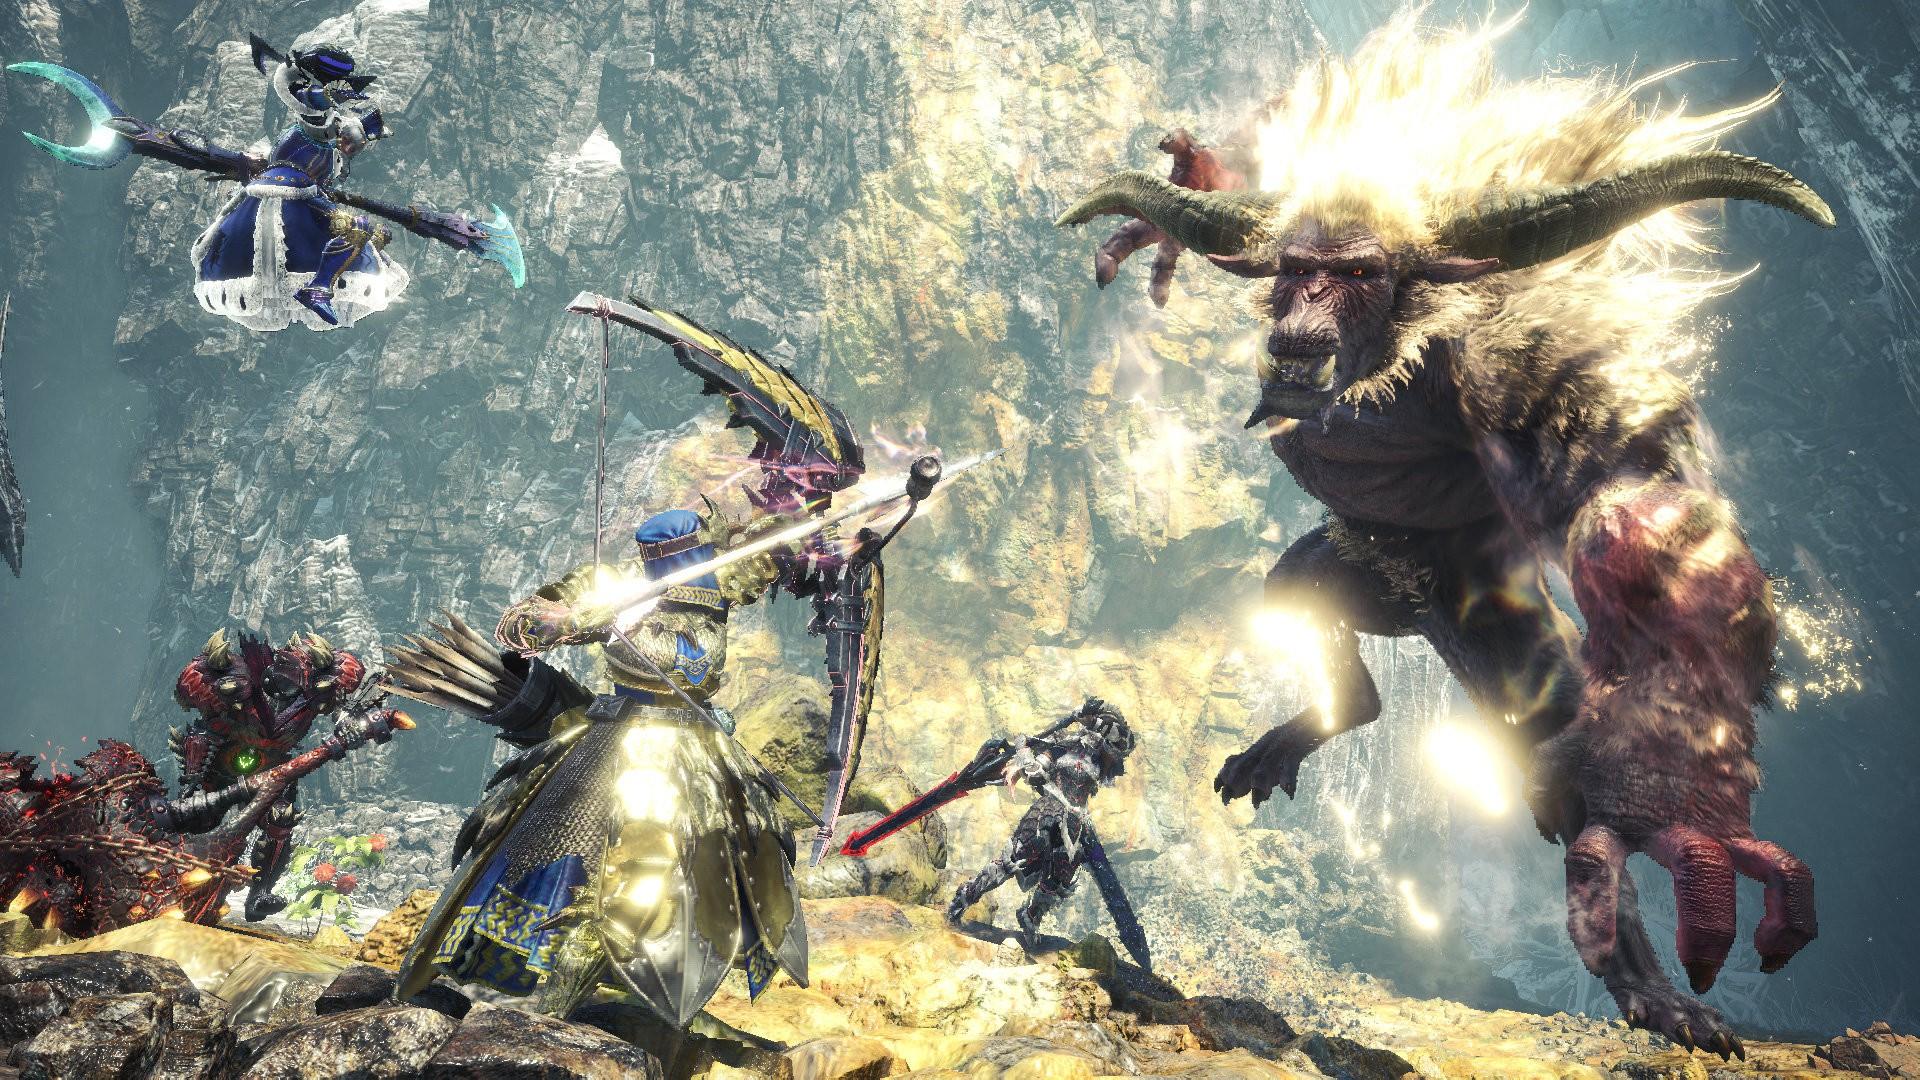 PS4《怪猎世界:冰原》第3弹免费更新上线 挑战新怪